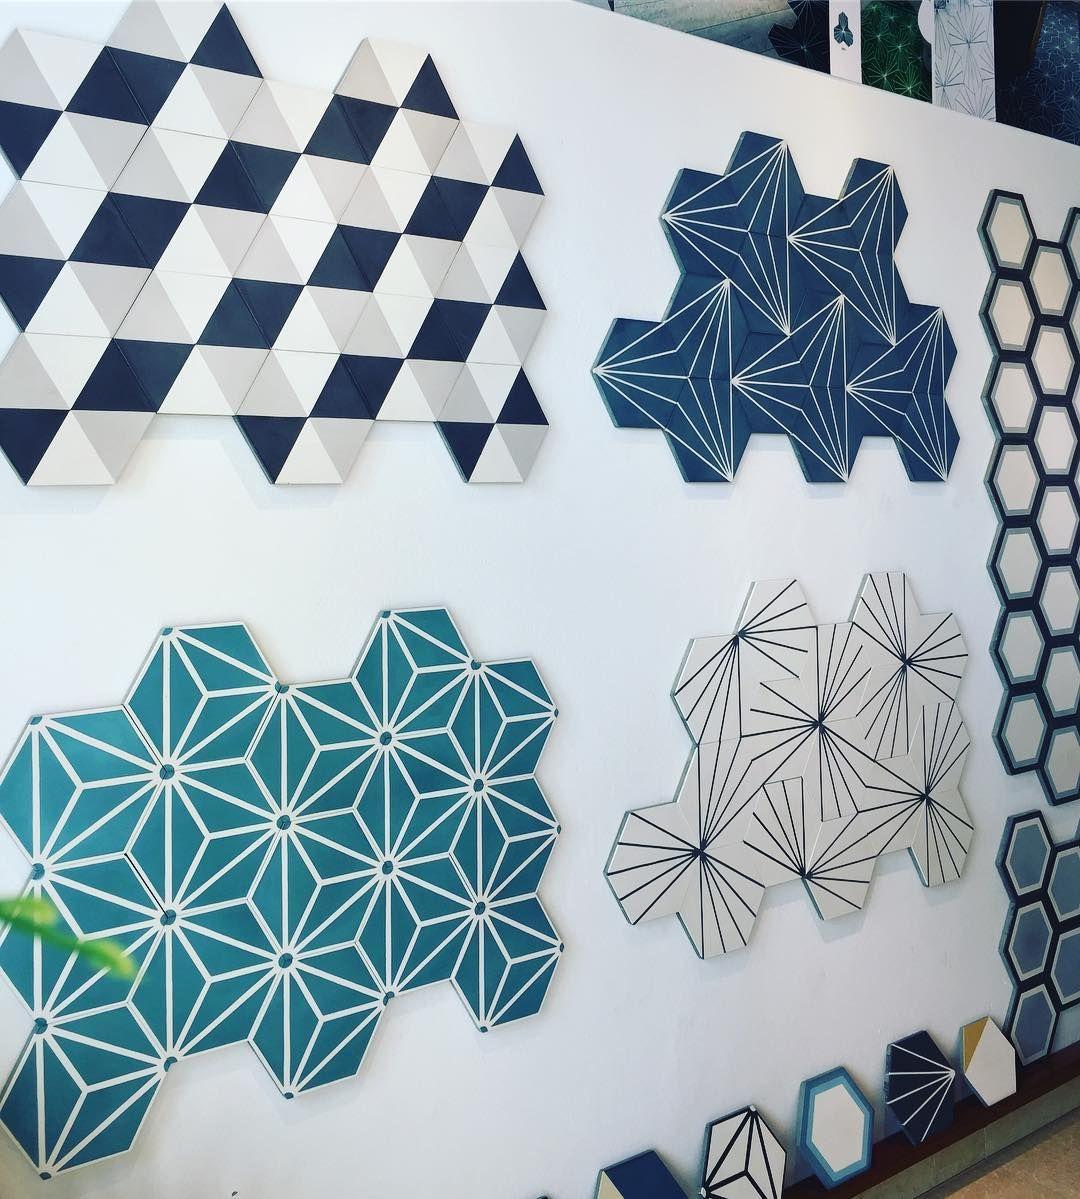 Eureka Cement Tiles On Instagram Madeinvietnam Concretetile Cementtiles Hexagonaltiles Eurekatile Deco Carrelage Deco Salle De Bain Idee Salle De Bain